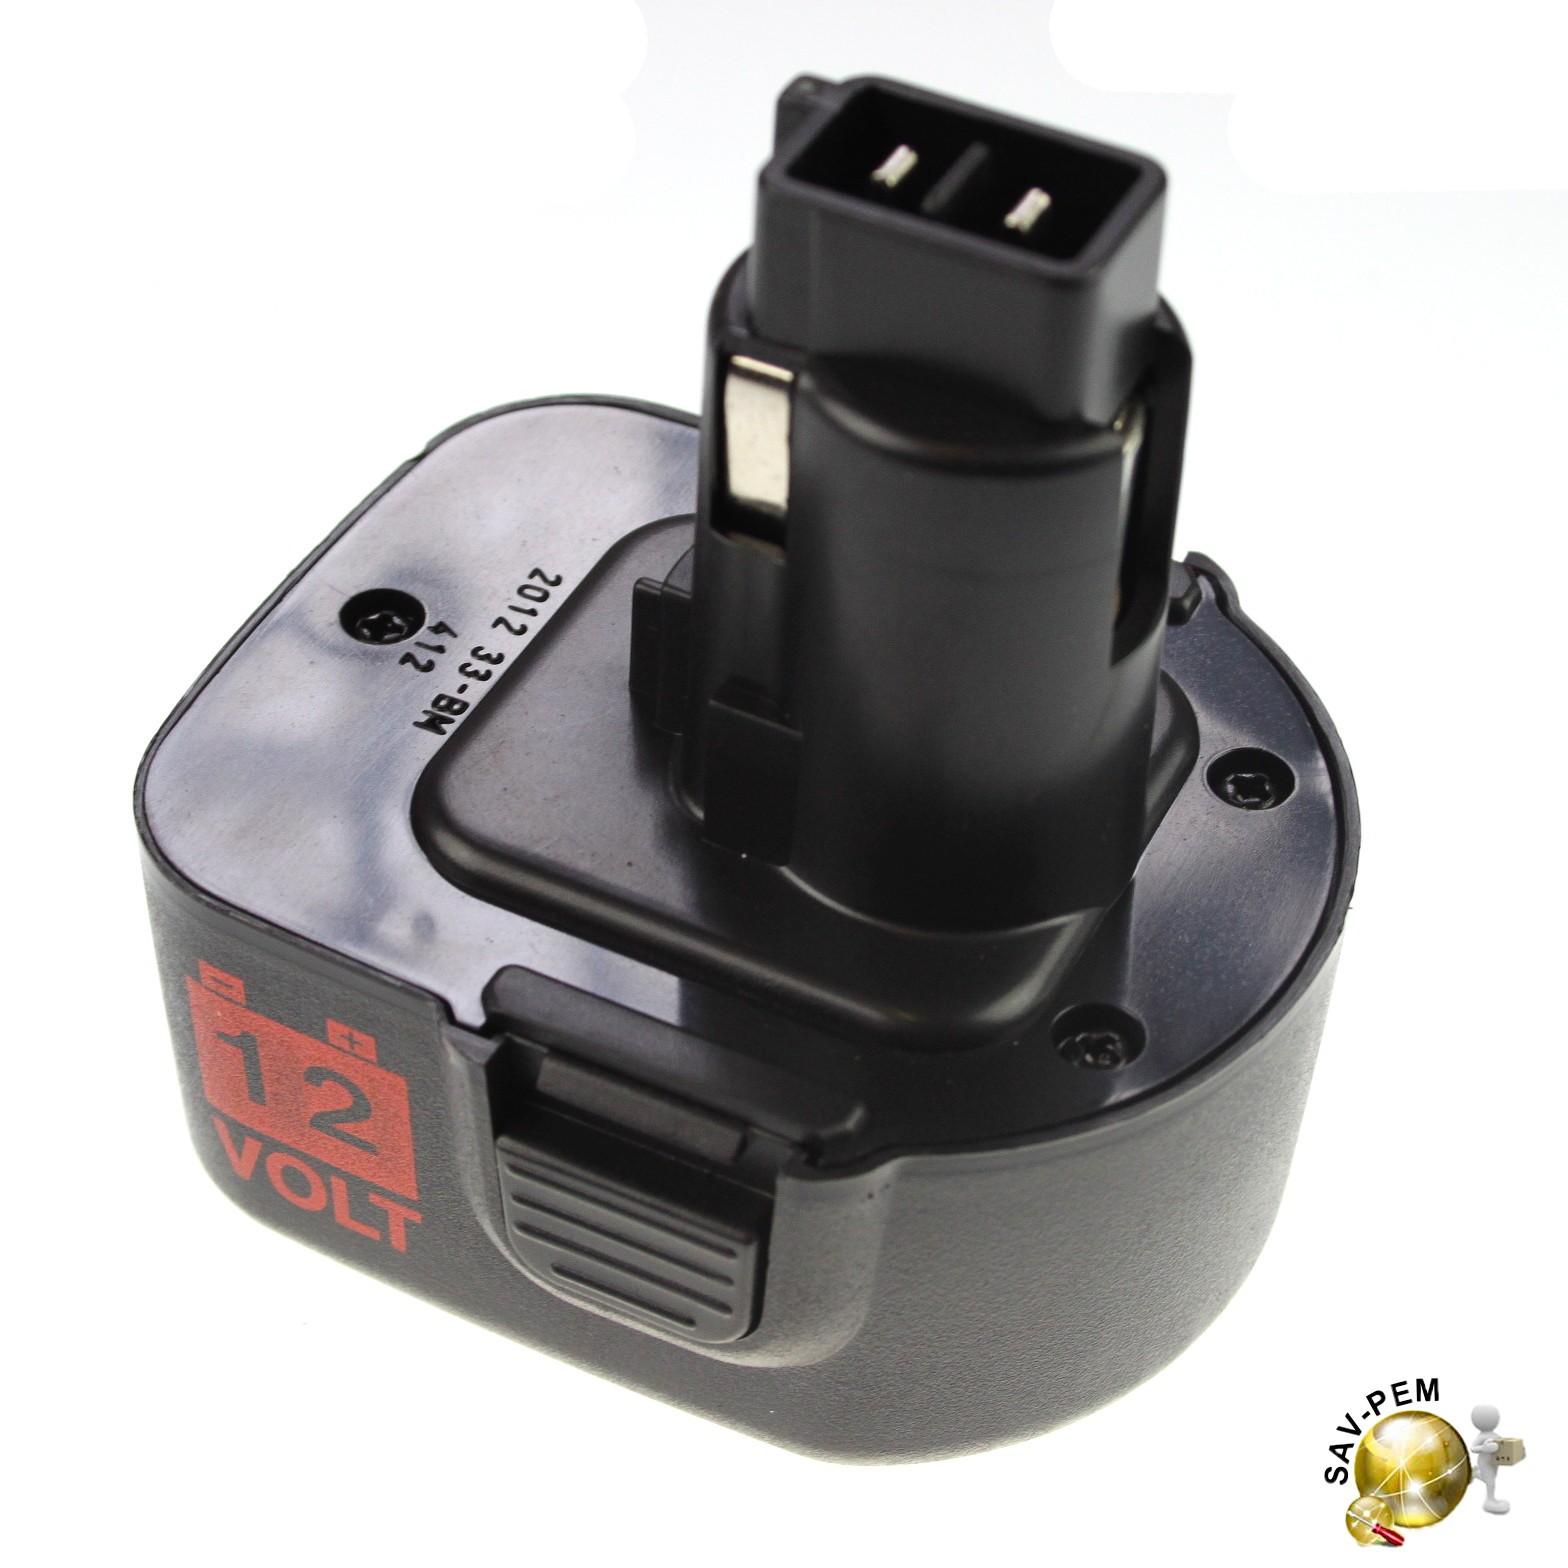 batterie black decker